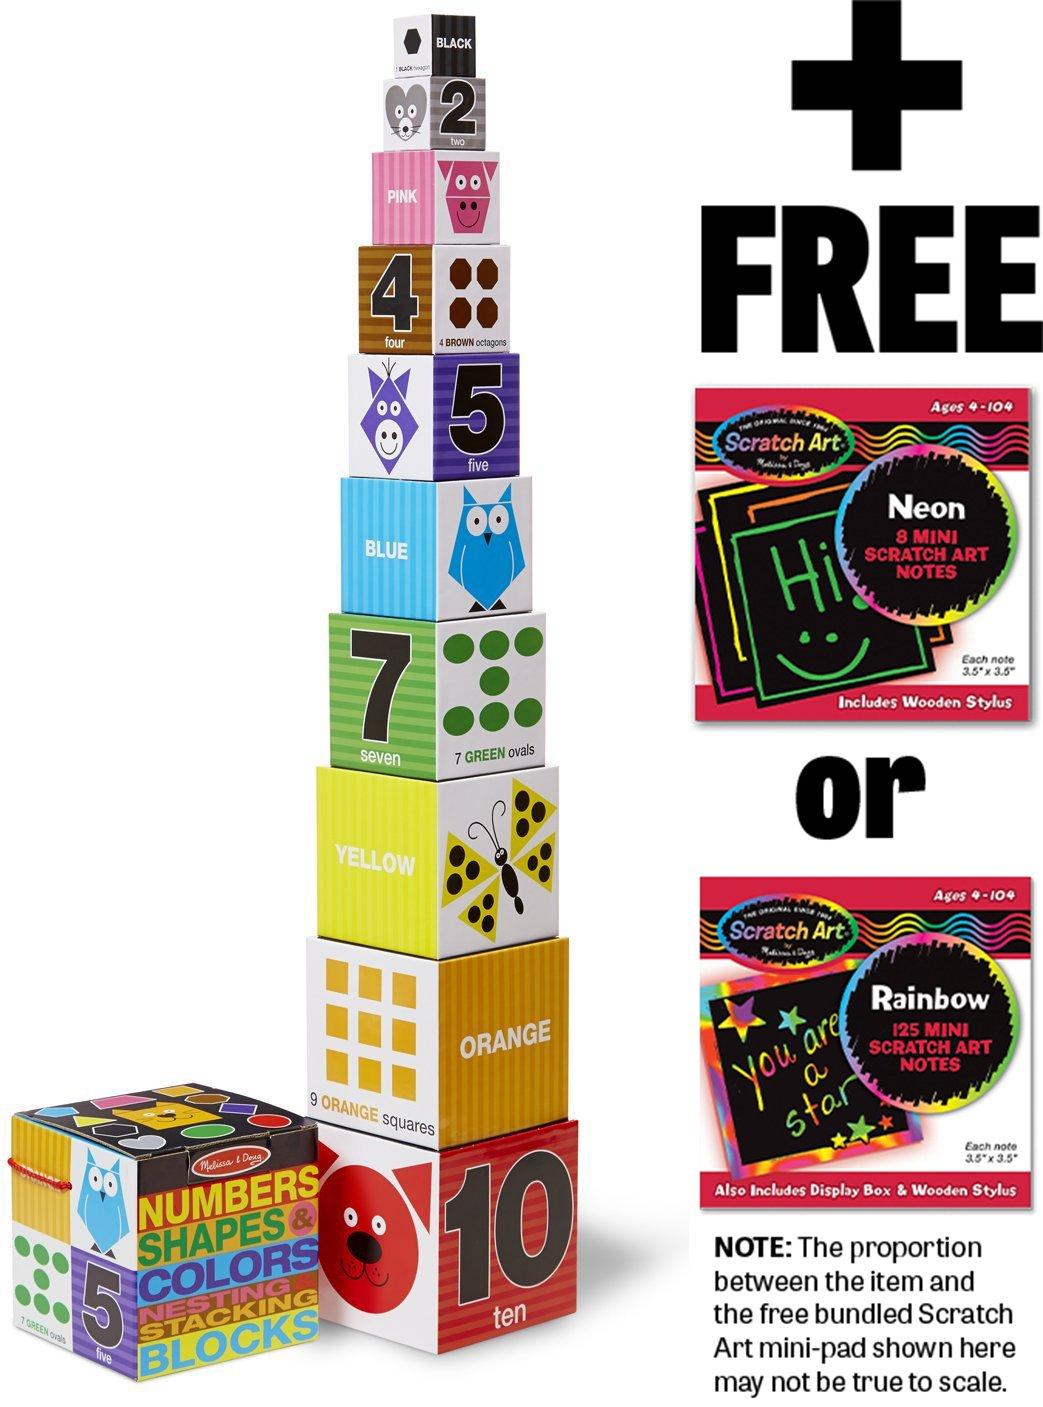 Numbers, Shapes & Colors Nesting Blocks 10-Piece Play Set + FREE Melissa & Doug Scratch Art Mini-Pad Bundle [90421]